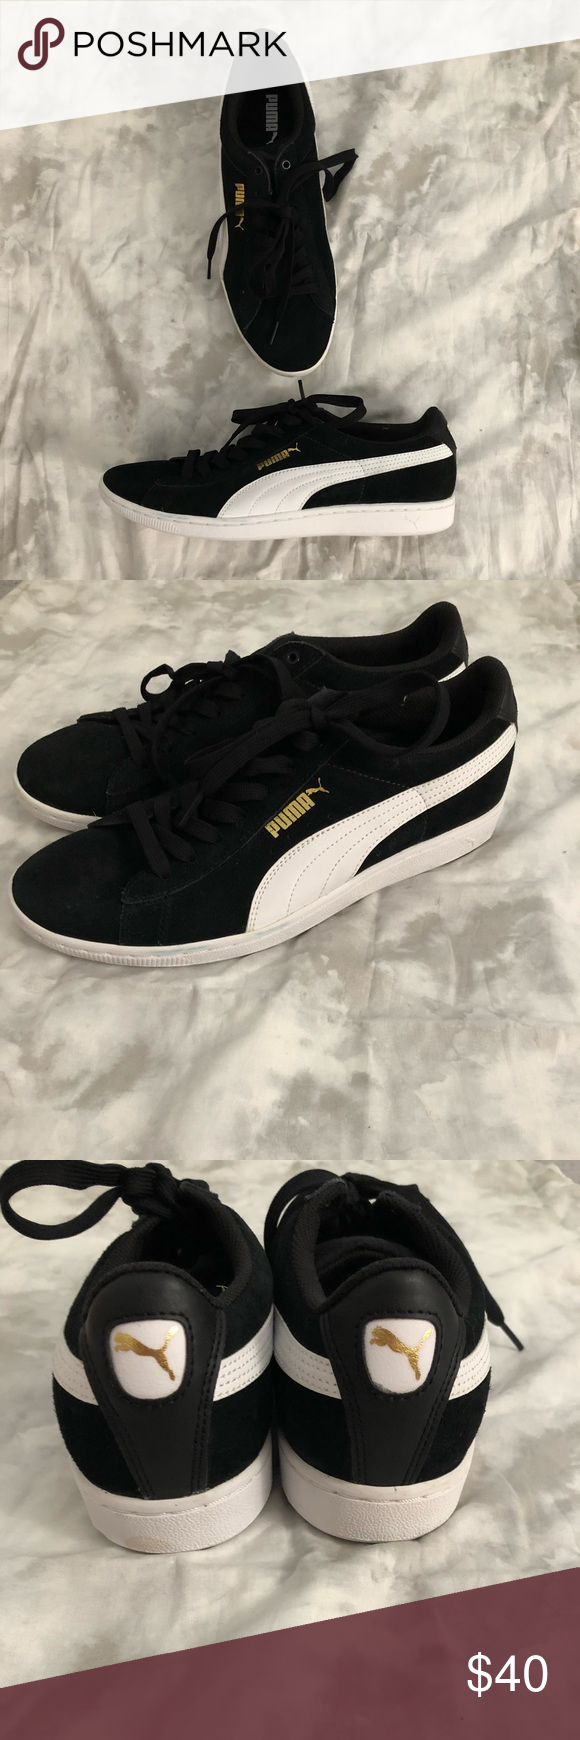 Sneakers, Puma sport, Womens shoes sneakers